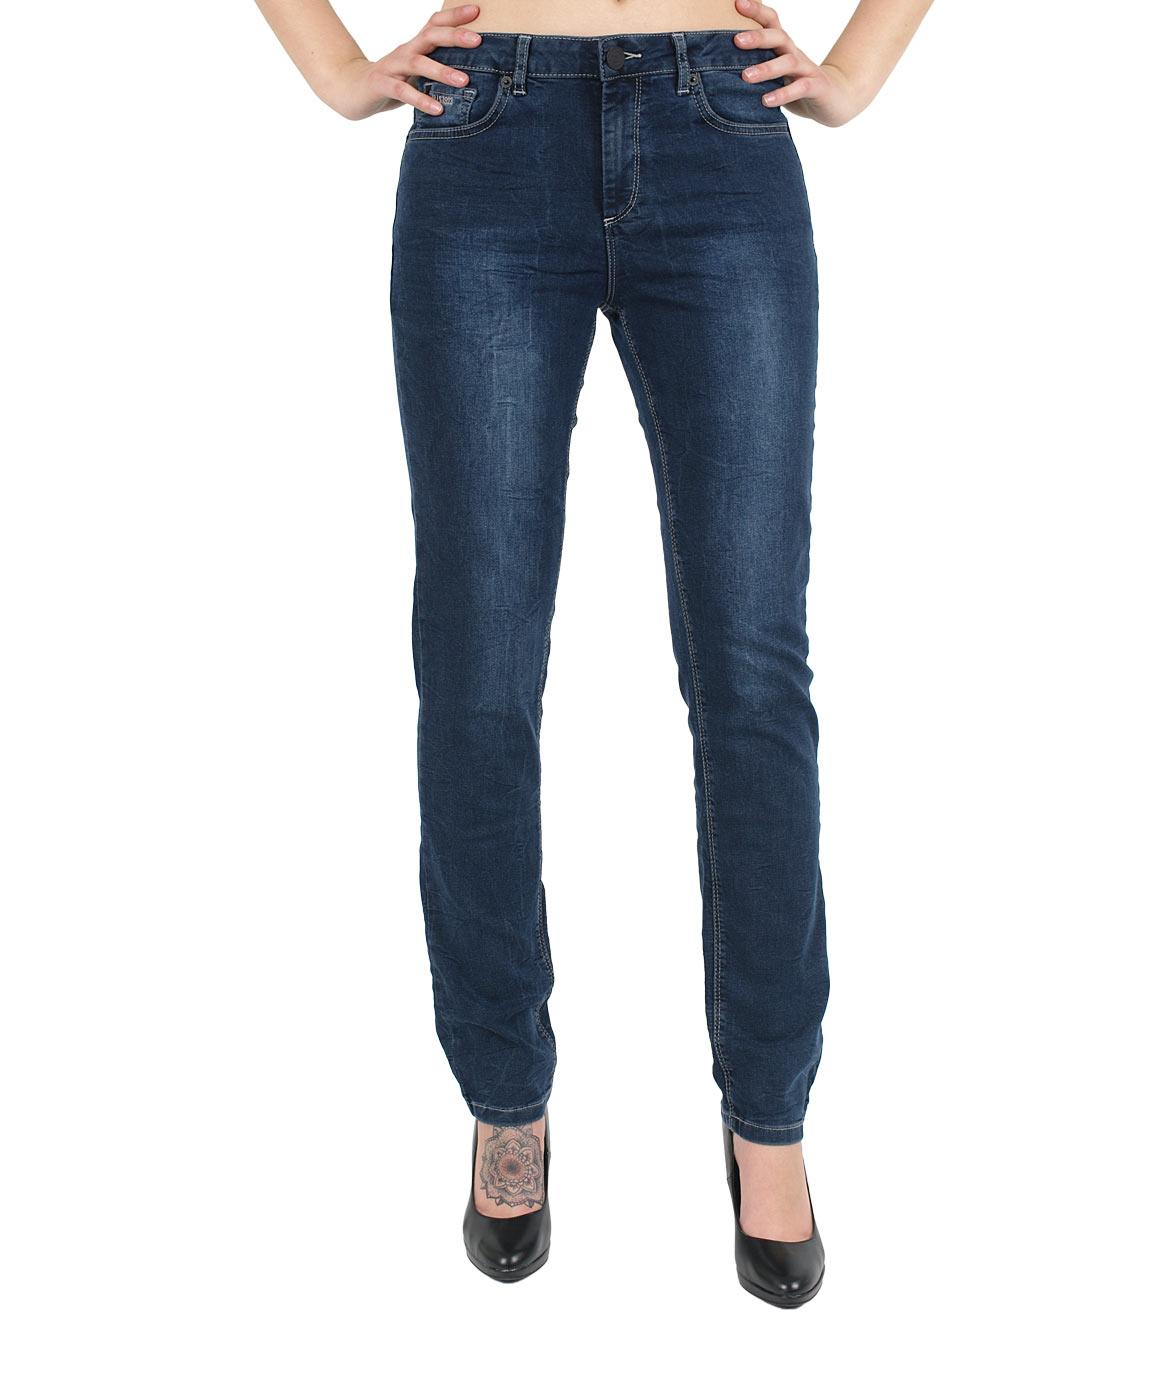 Hosen für Frauen - HIS MARYLIN Jeans Comfort Fit Relax Wash  - Onlineshop Jeans Meile